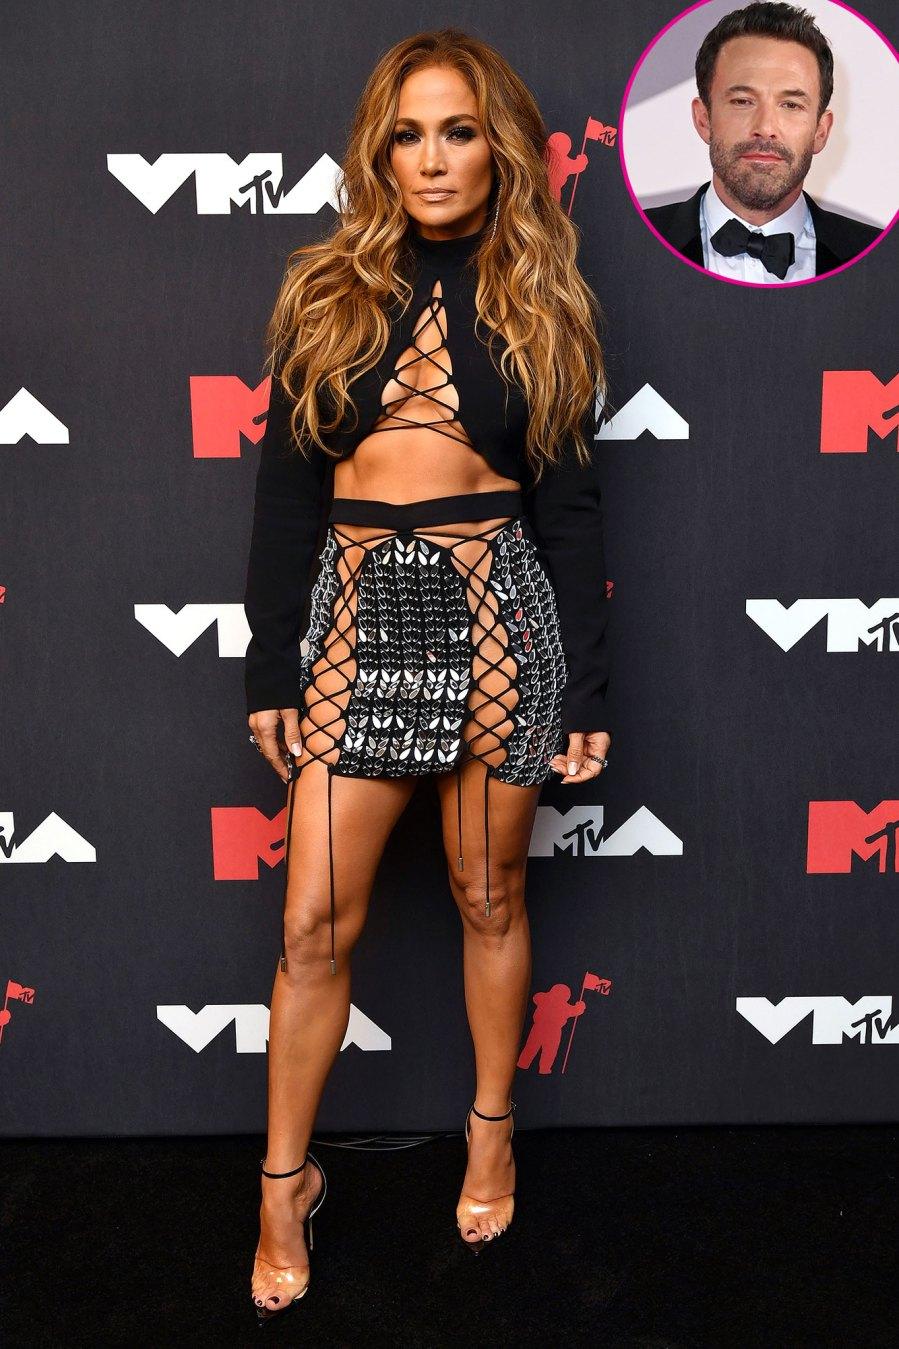 Jennifer Lopez Stuns in Skin-Baring Skirt MTV 2021 VMAs Feature